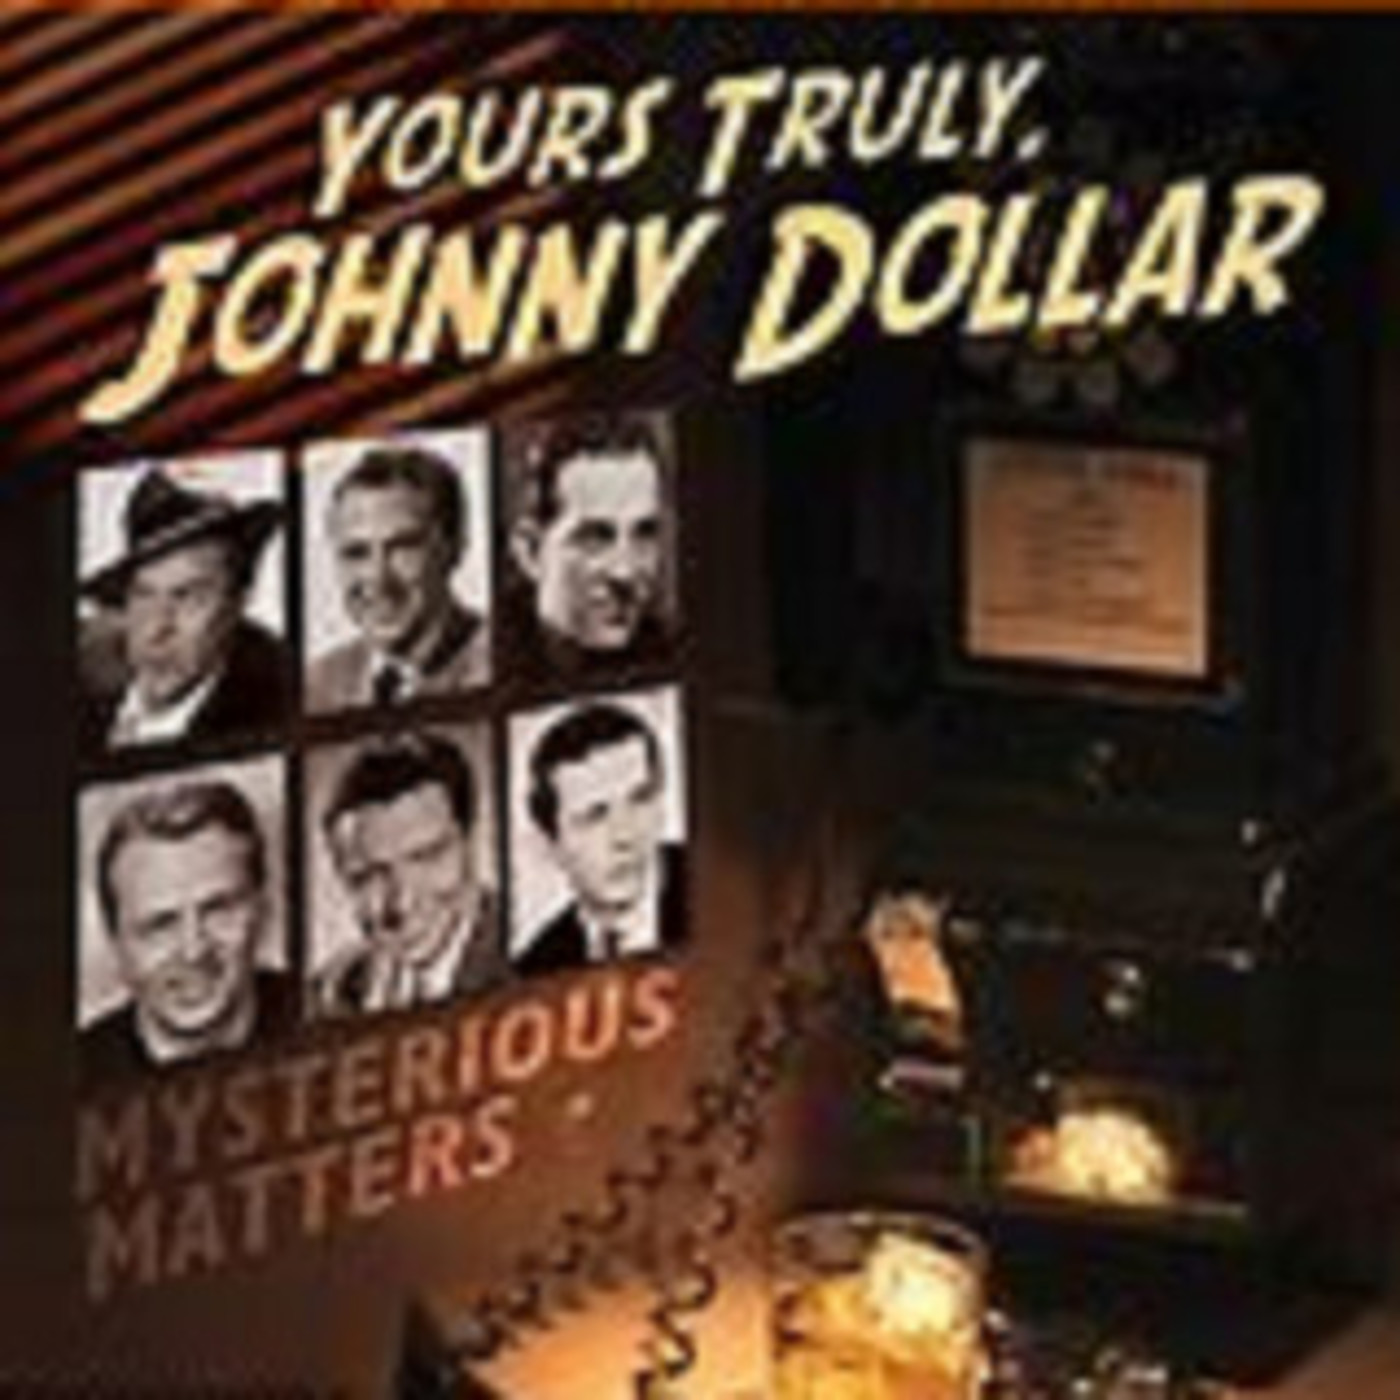 Yours Truly, Johnny Dollar - 090262, episode 807 - The Doninger Doninger Matter